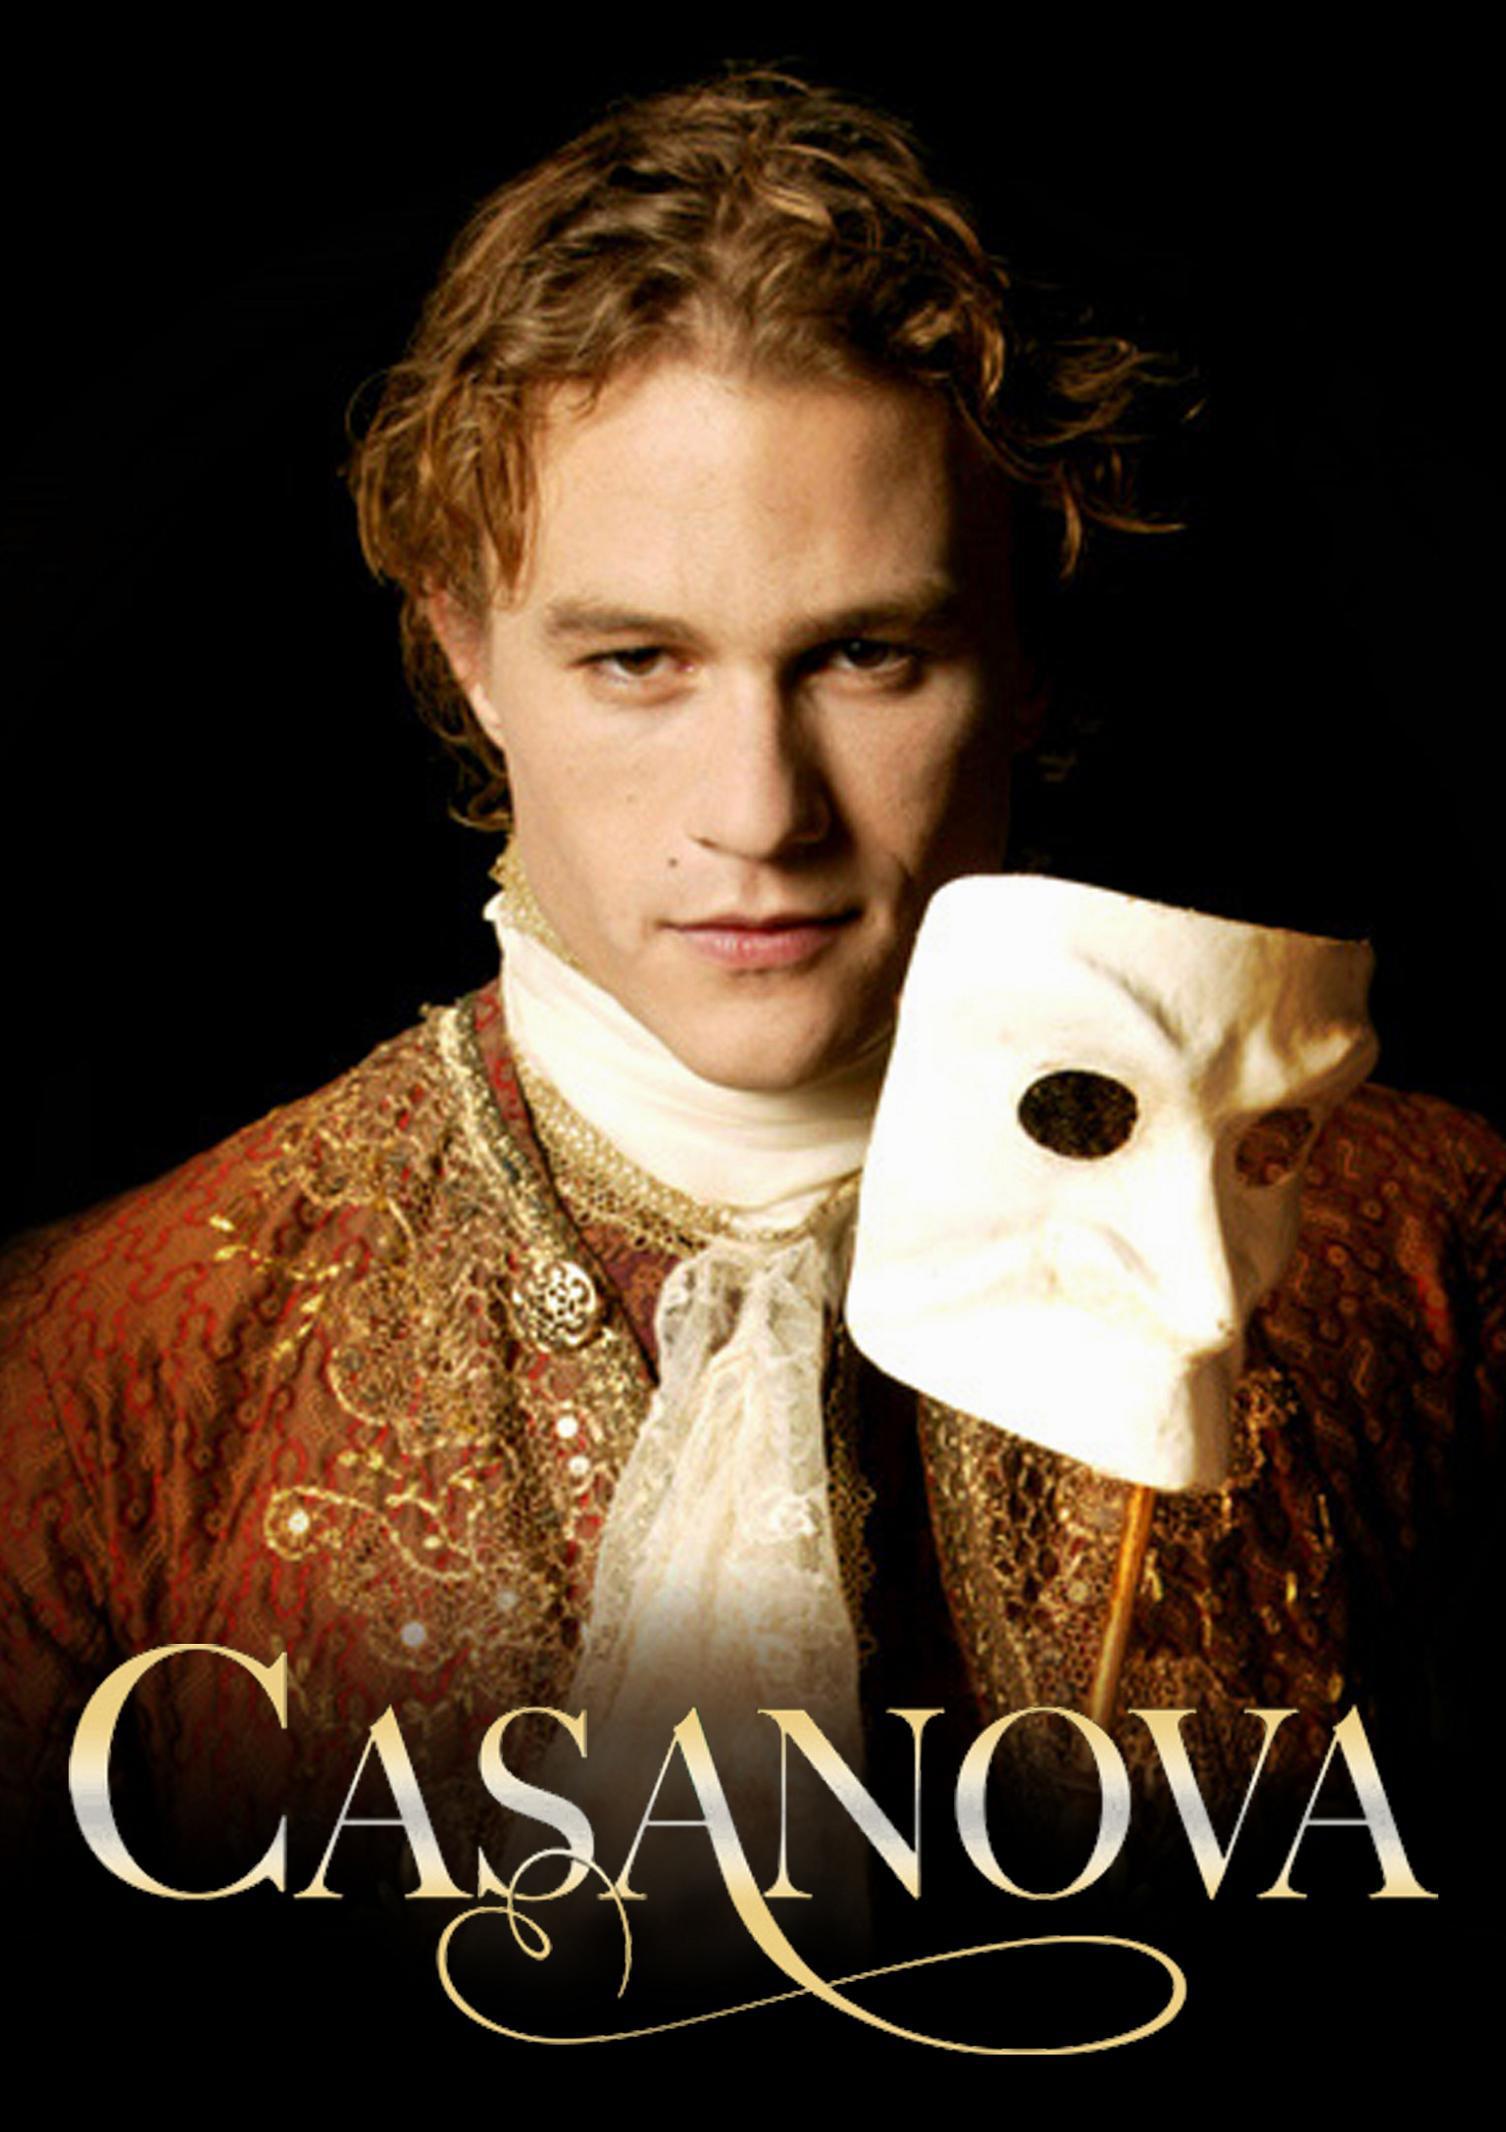 Casanova porn film